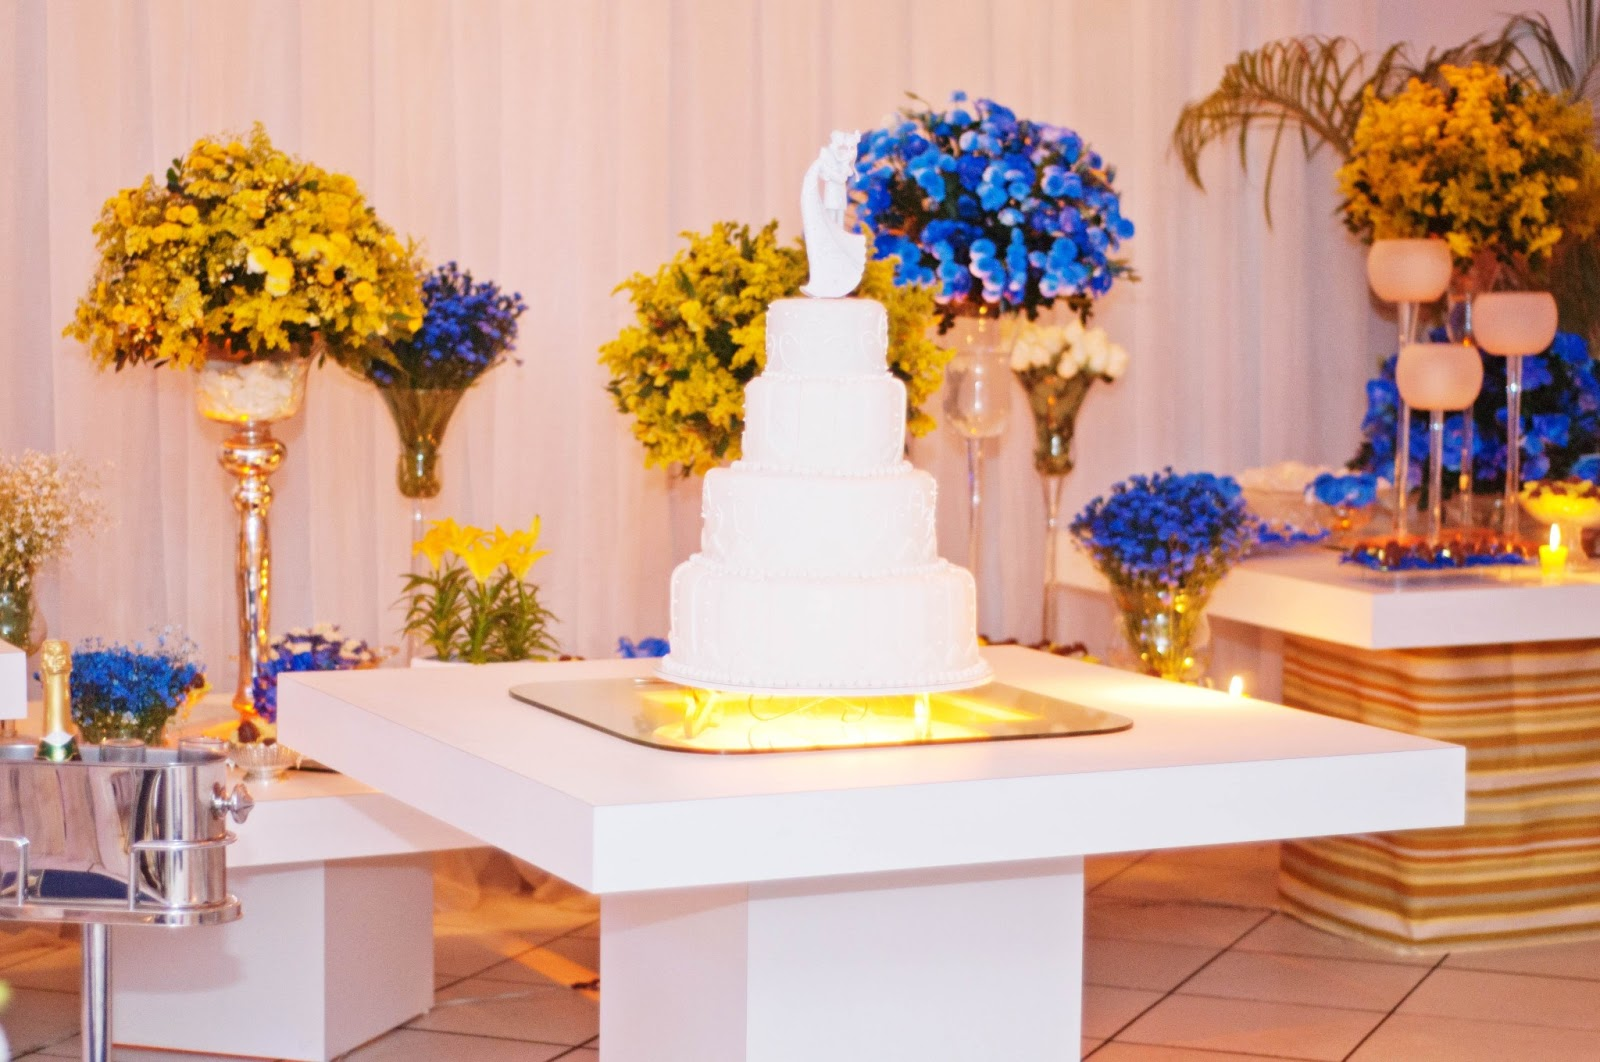 decoracao casamento rustico azul e amarelo:Decor+casamento+azul+e+amarelo+02.jpg